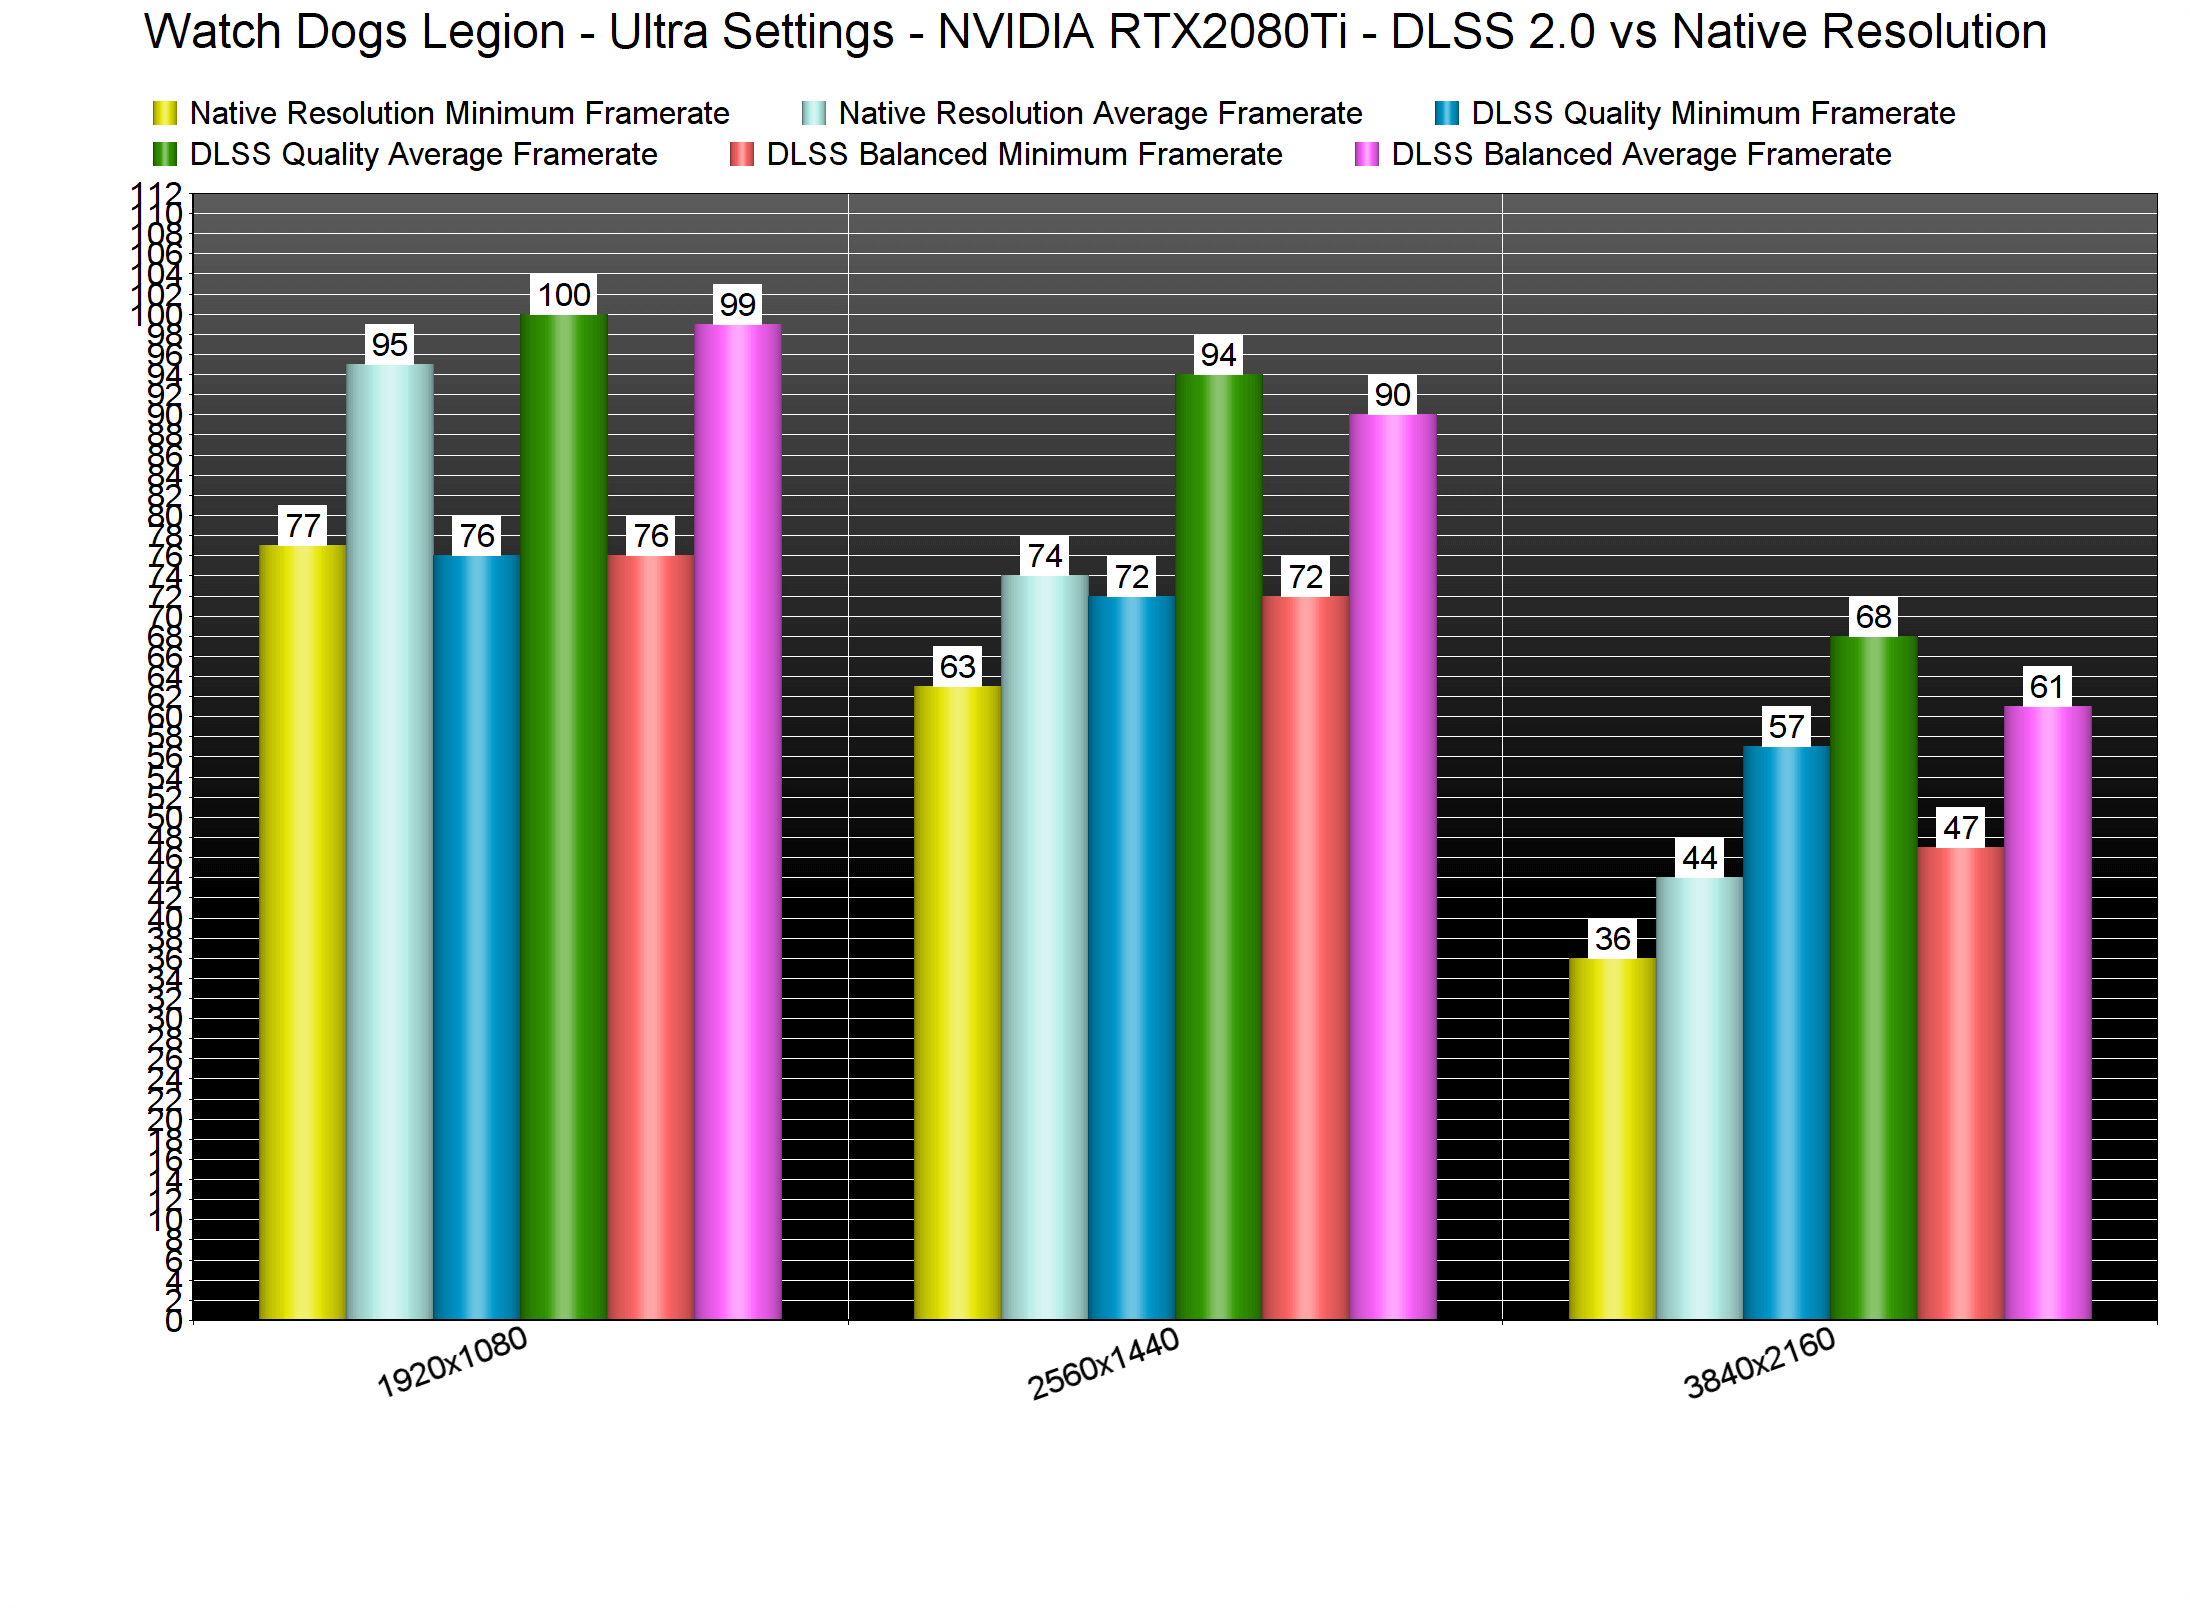 Watch Dogs Legion DLSS 2.0 benchmarks